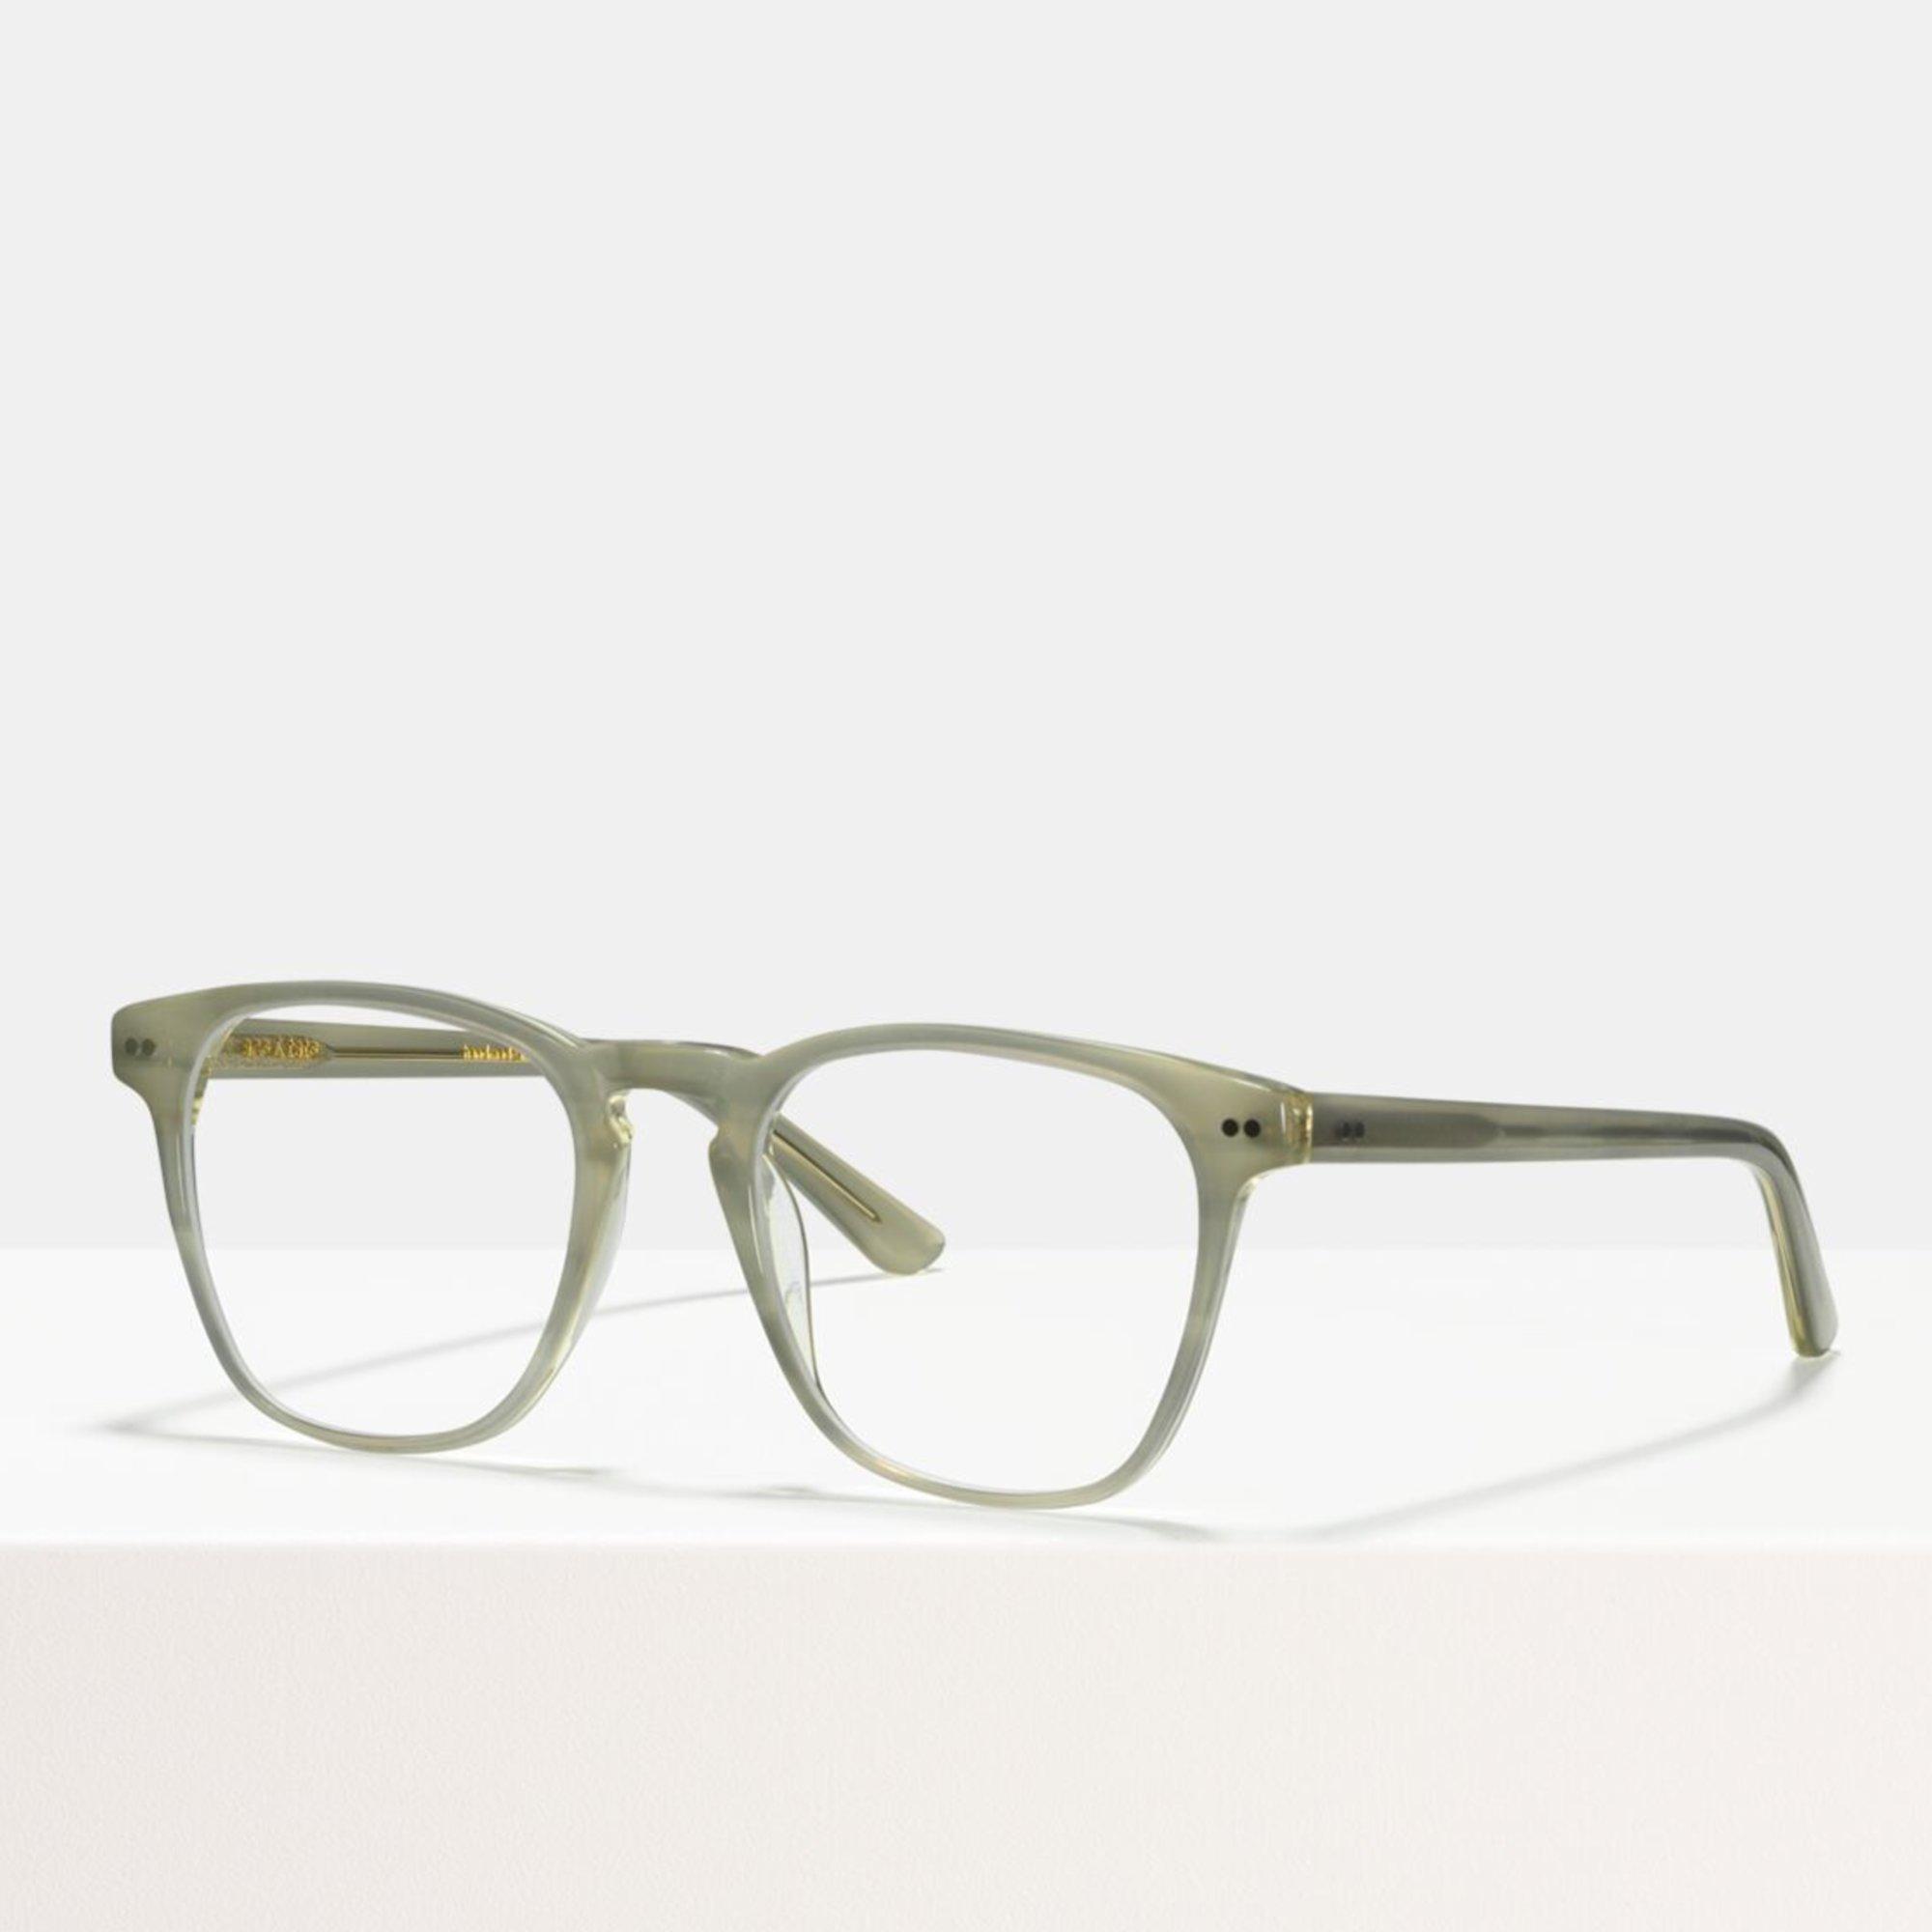 Ace & Tate Glasses | square acetate in Grey, White